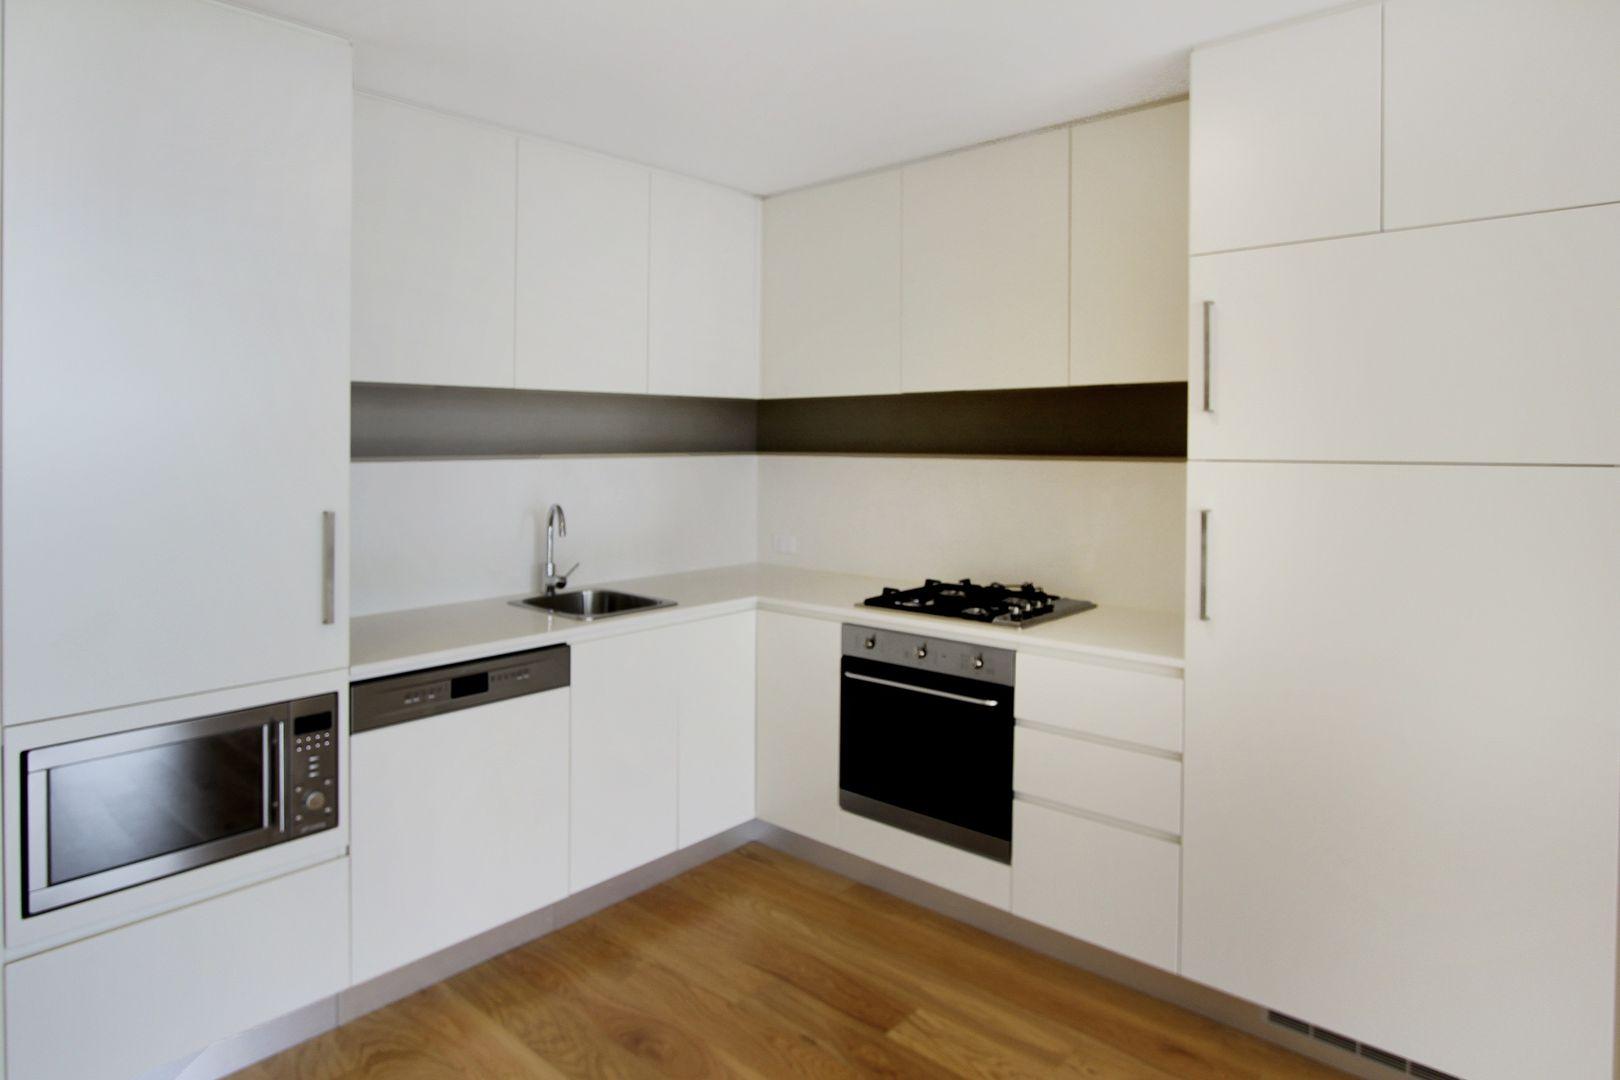 309/3 Mooltan Ave, Macquarie Park NSW 2113, Image 2